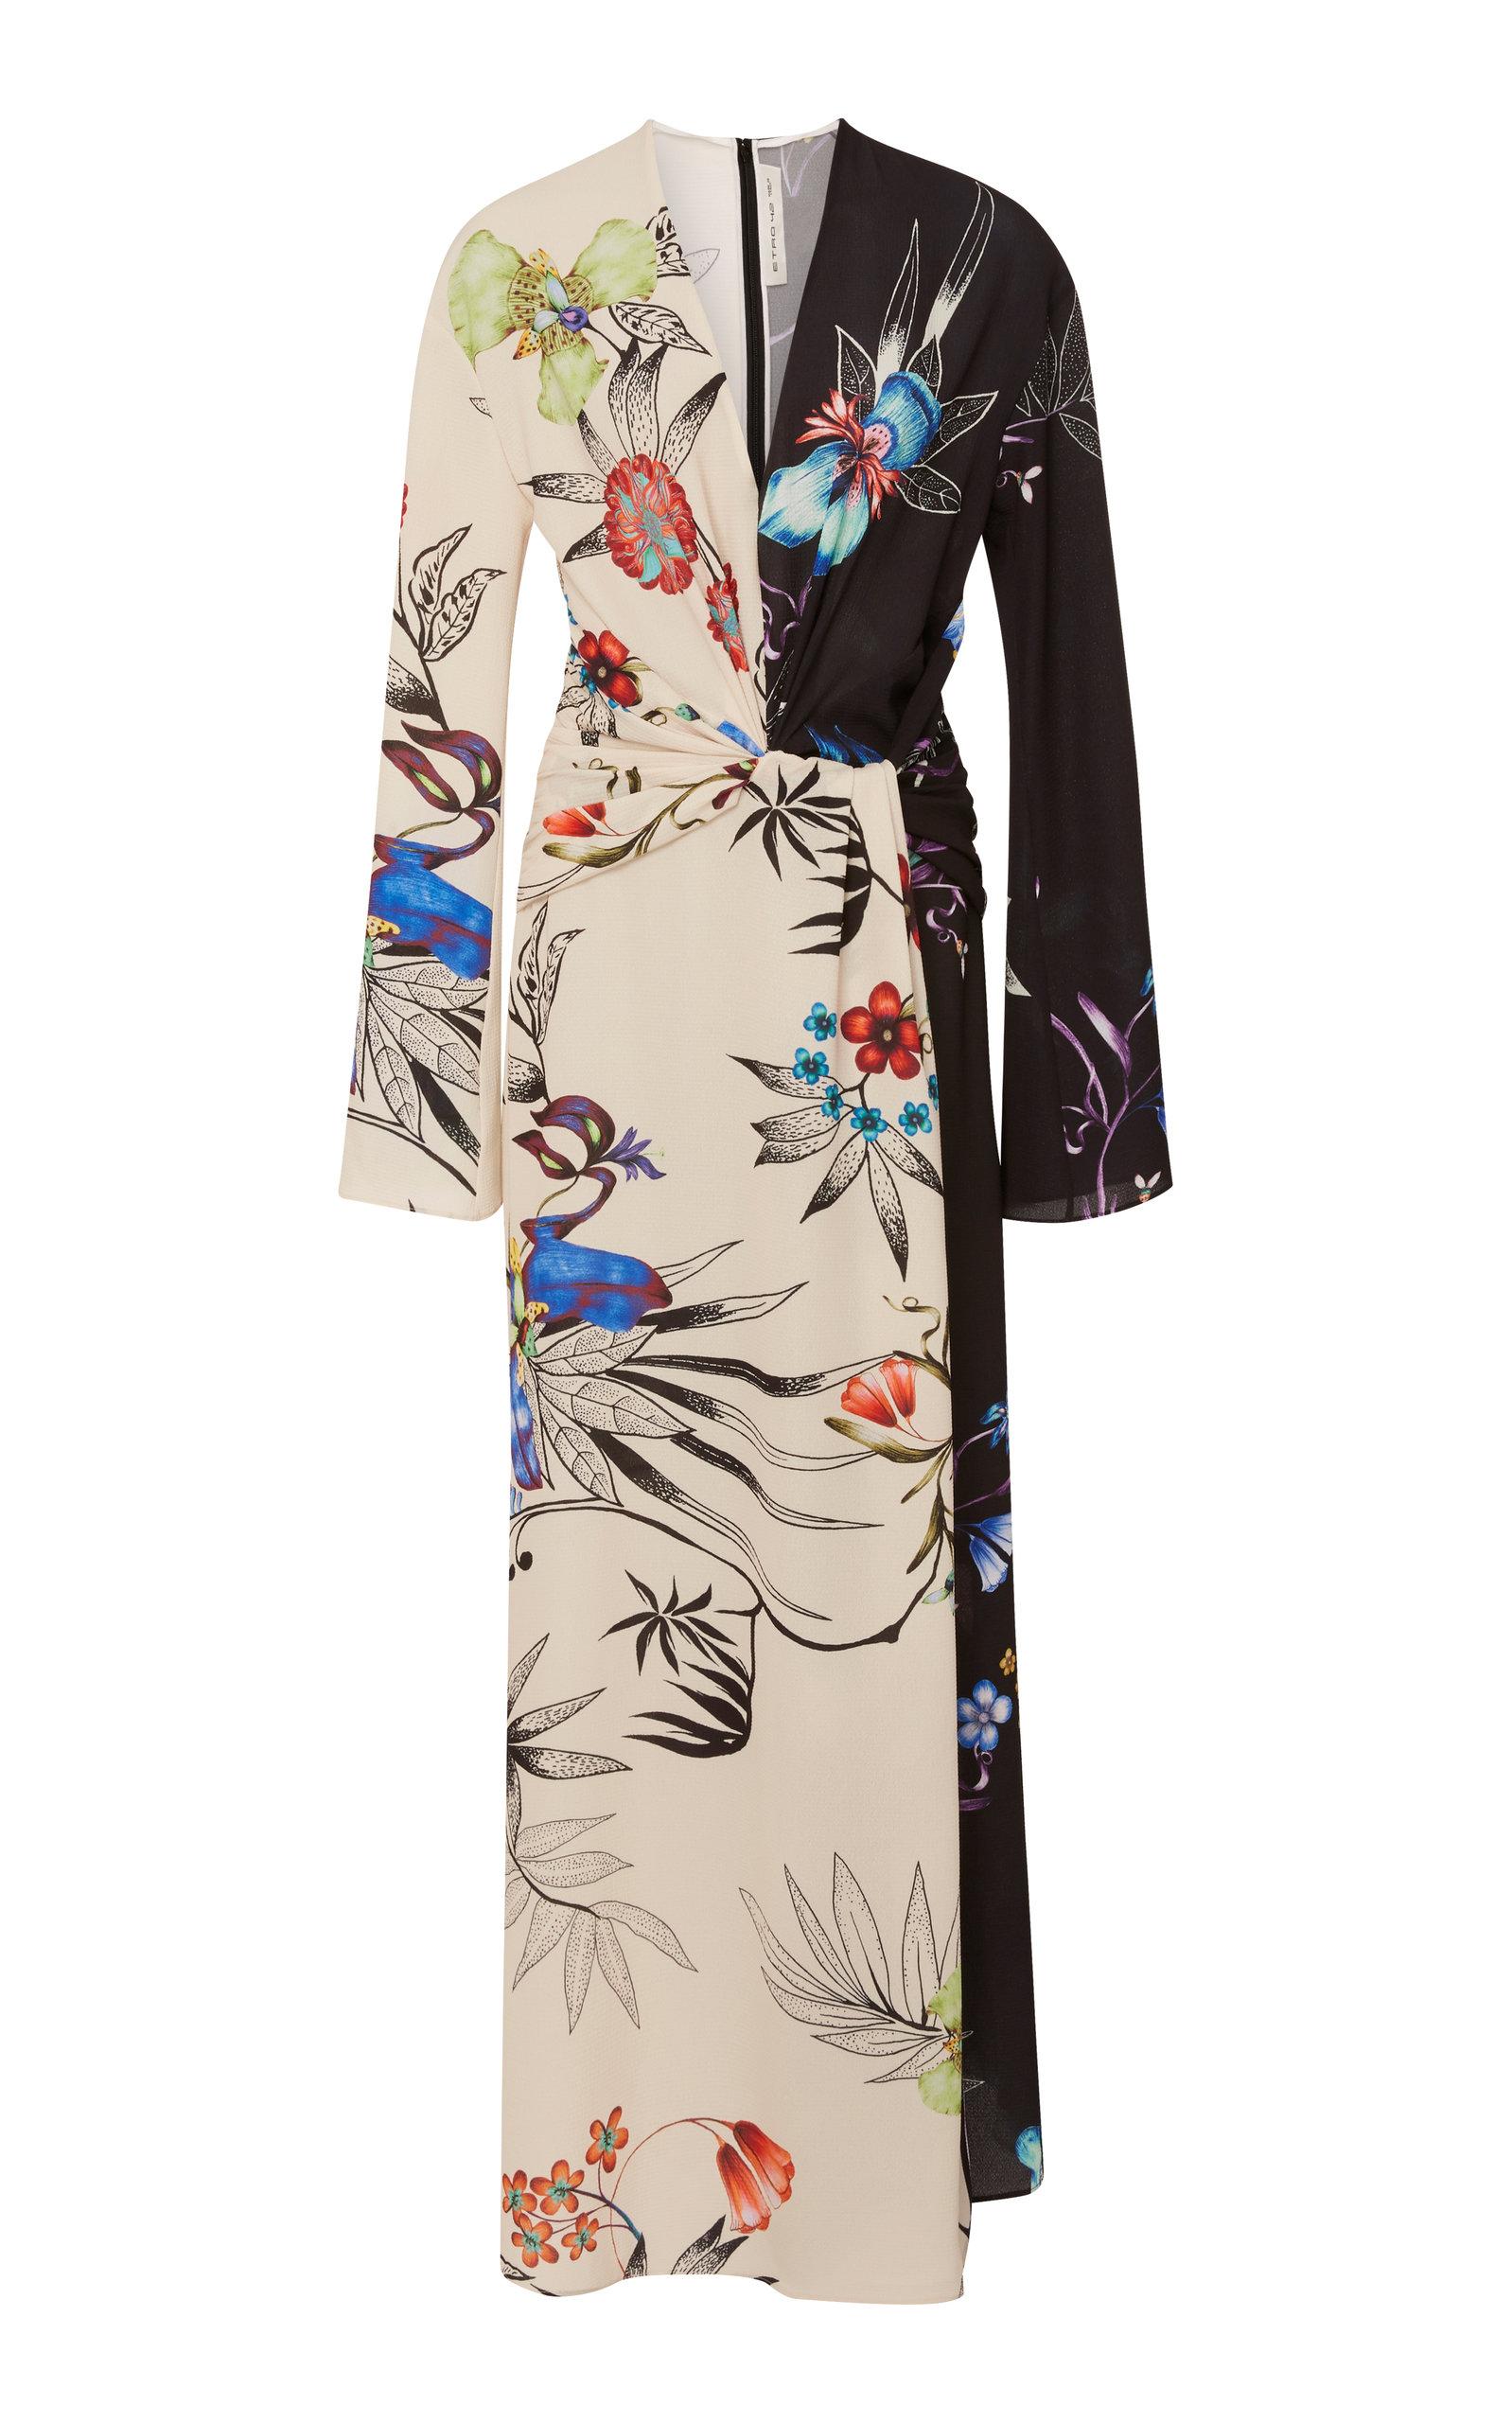 Etro Dress Peggy Two-Tone Floral Crepe Maxi Dress